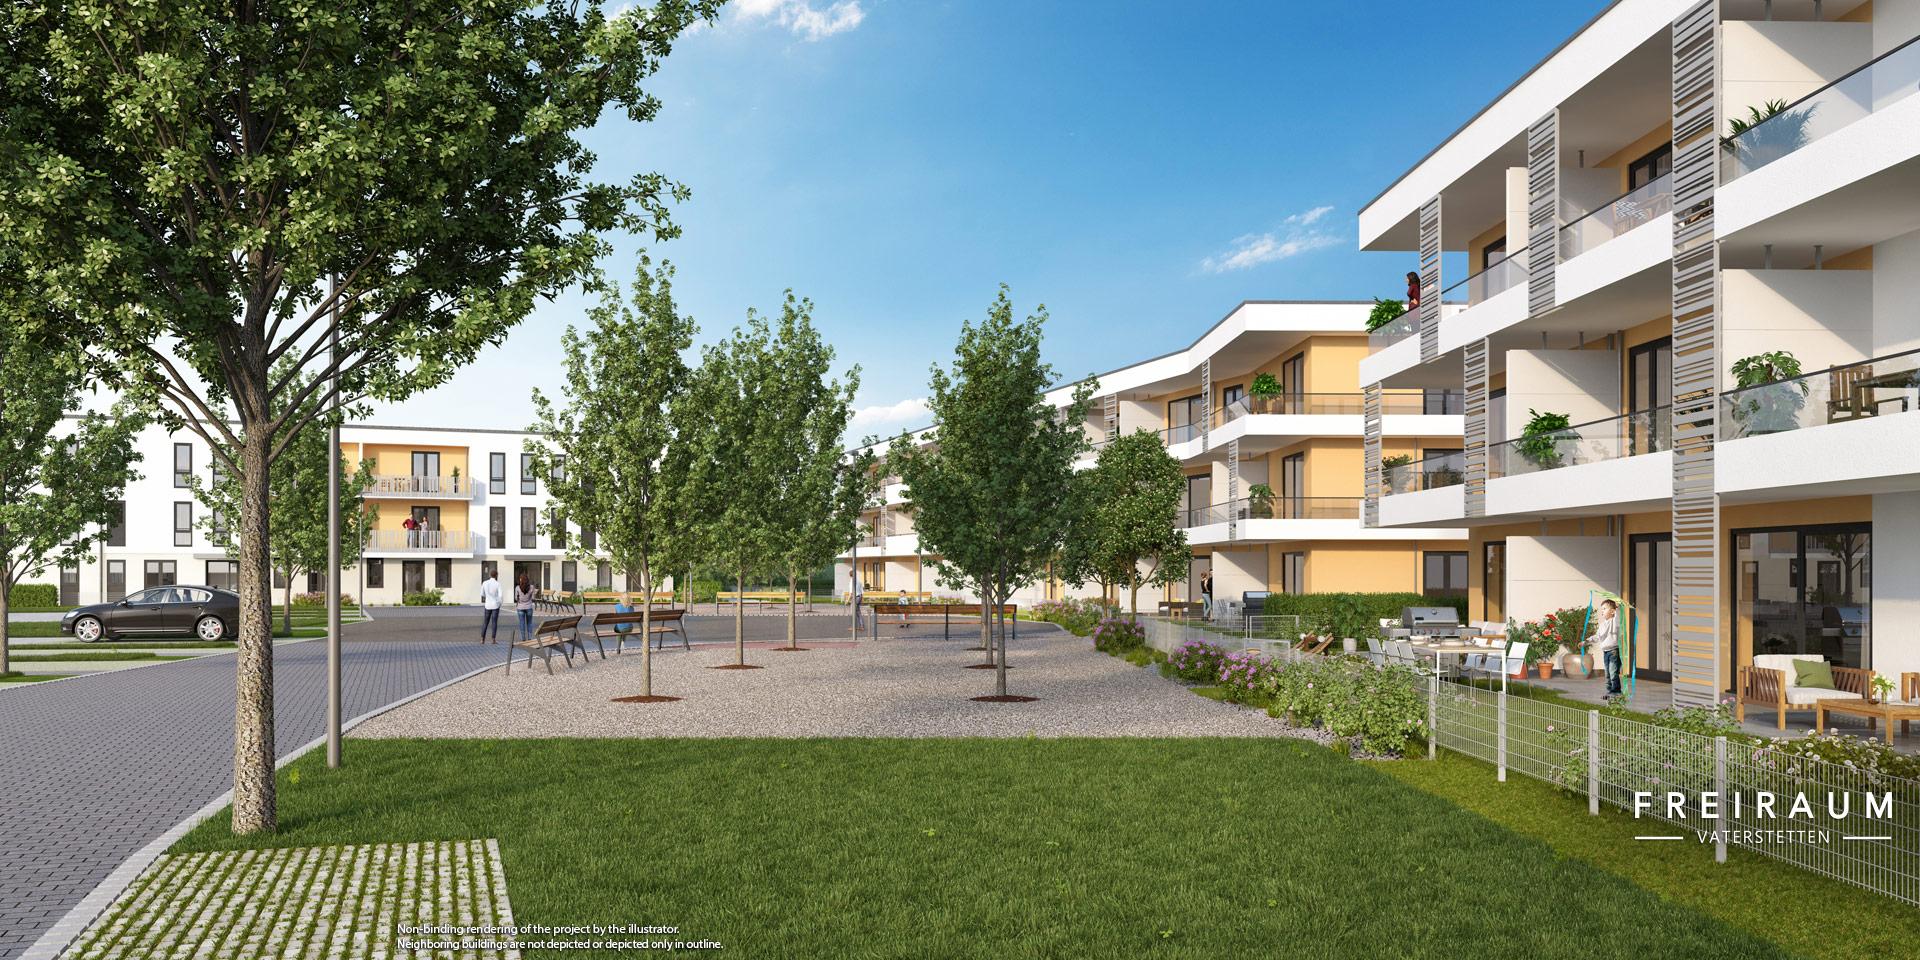 Property Munich: Freiraum Vaterstetten